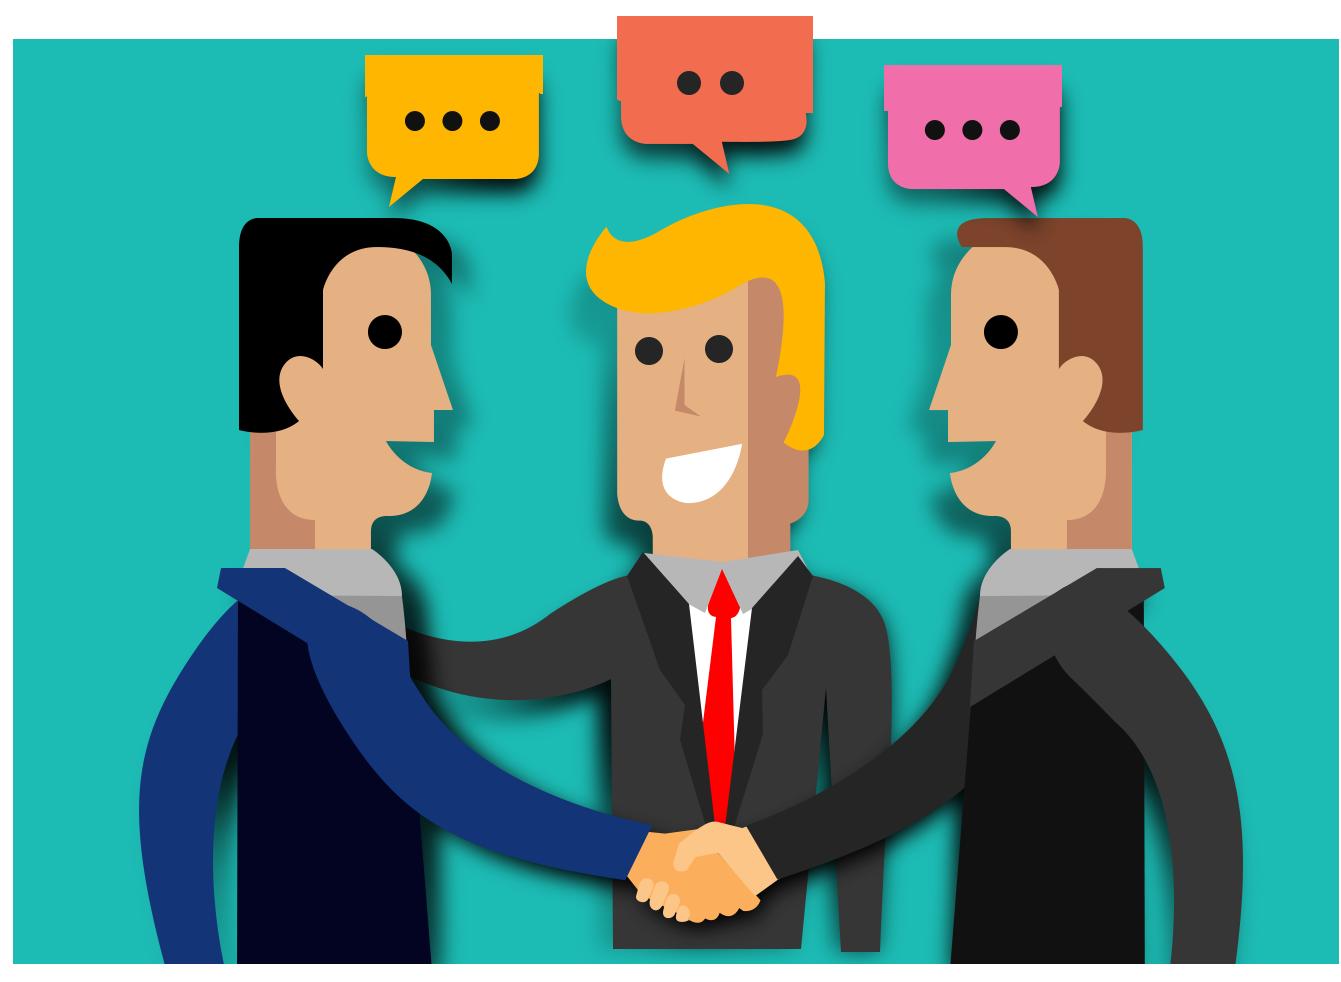 Conversation clipart design. Social media graphic clip